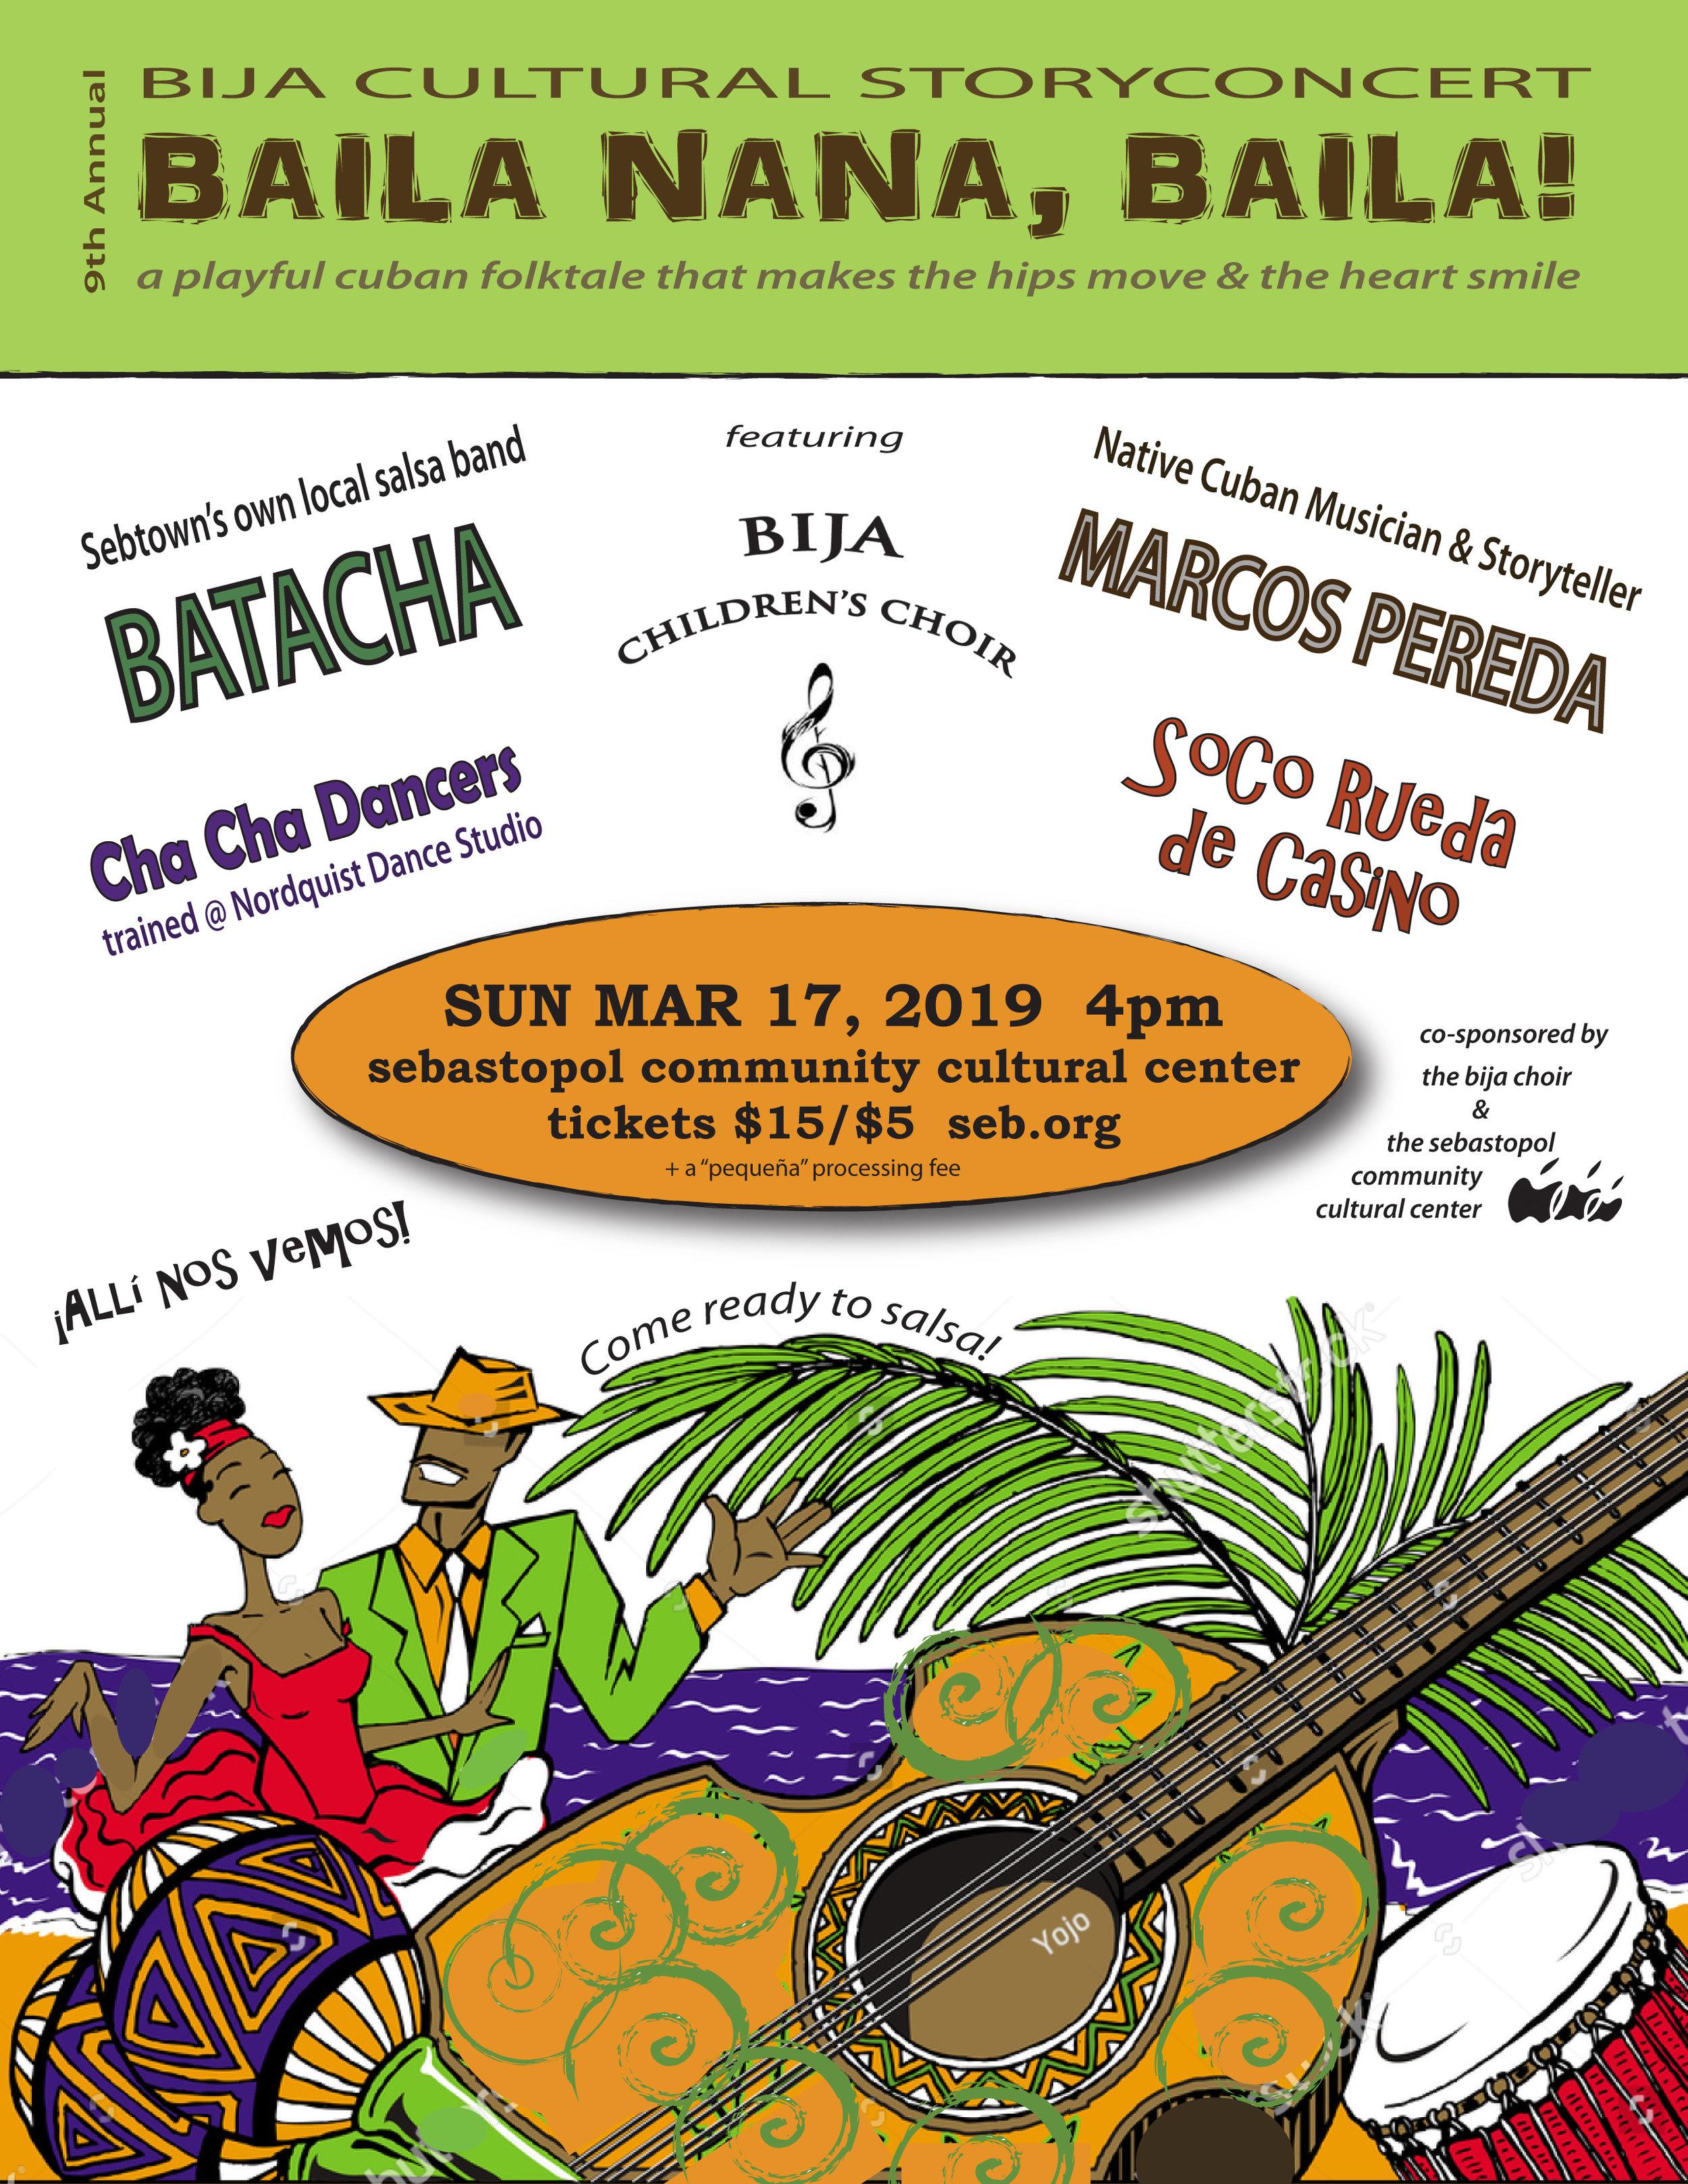 2019 Bija Cuban Storyconcert flier FINAL 2.jpg